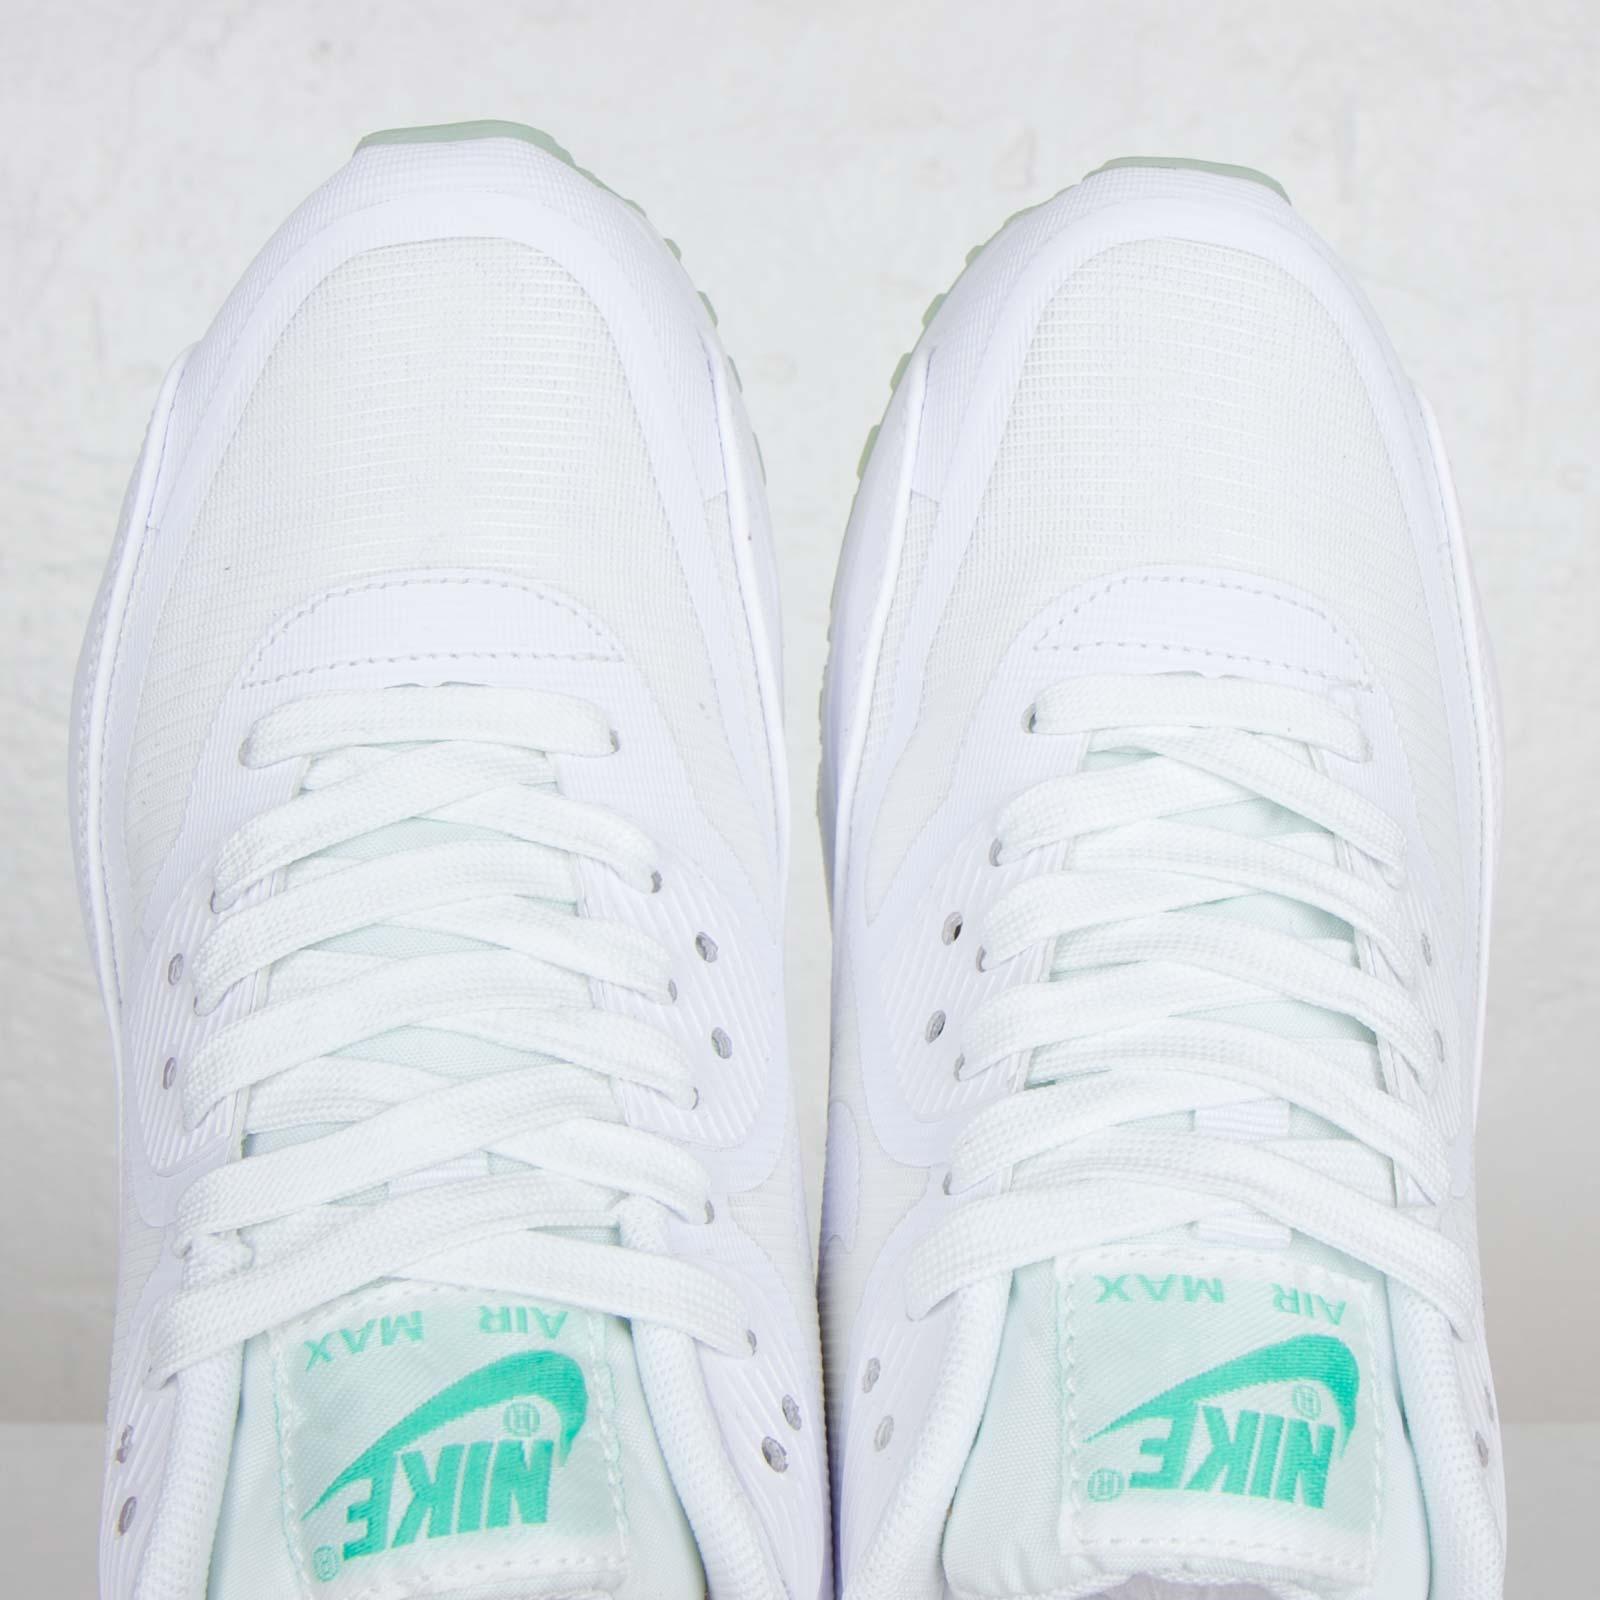 Nike Wmns Air Max 90 CMFT Premium Tape 616466 113